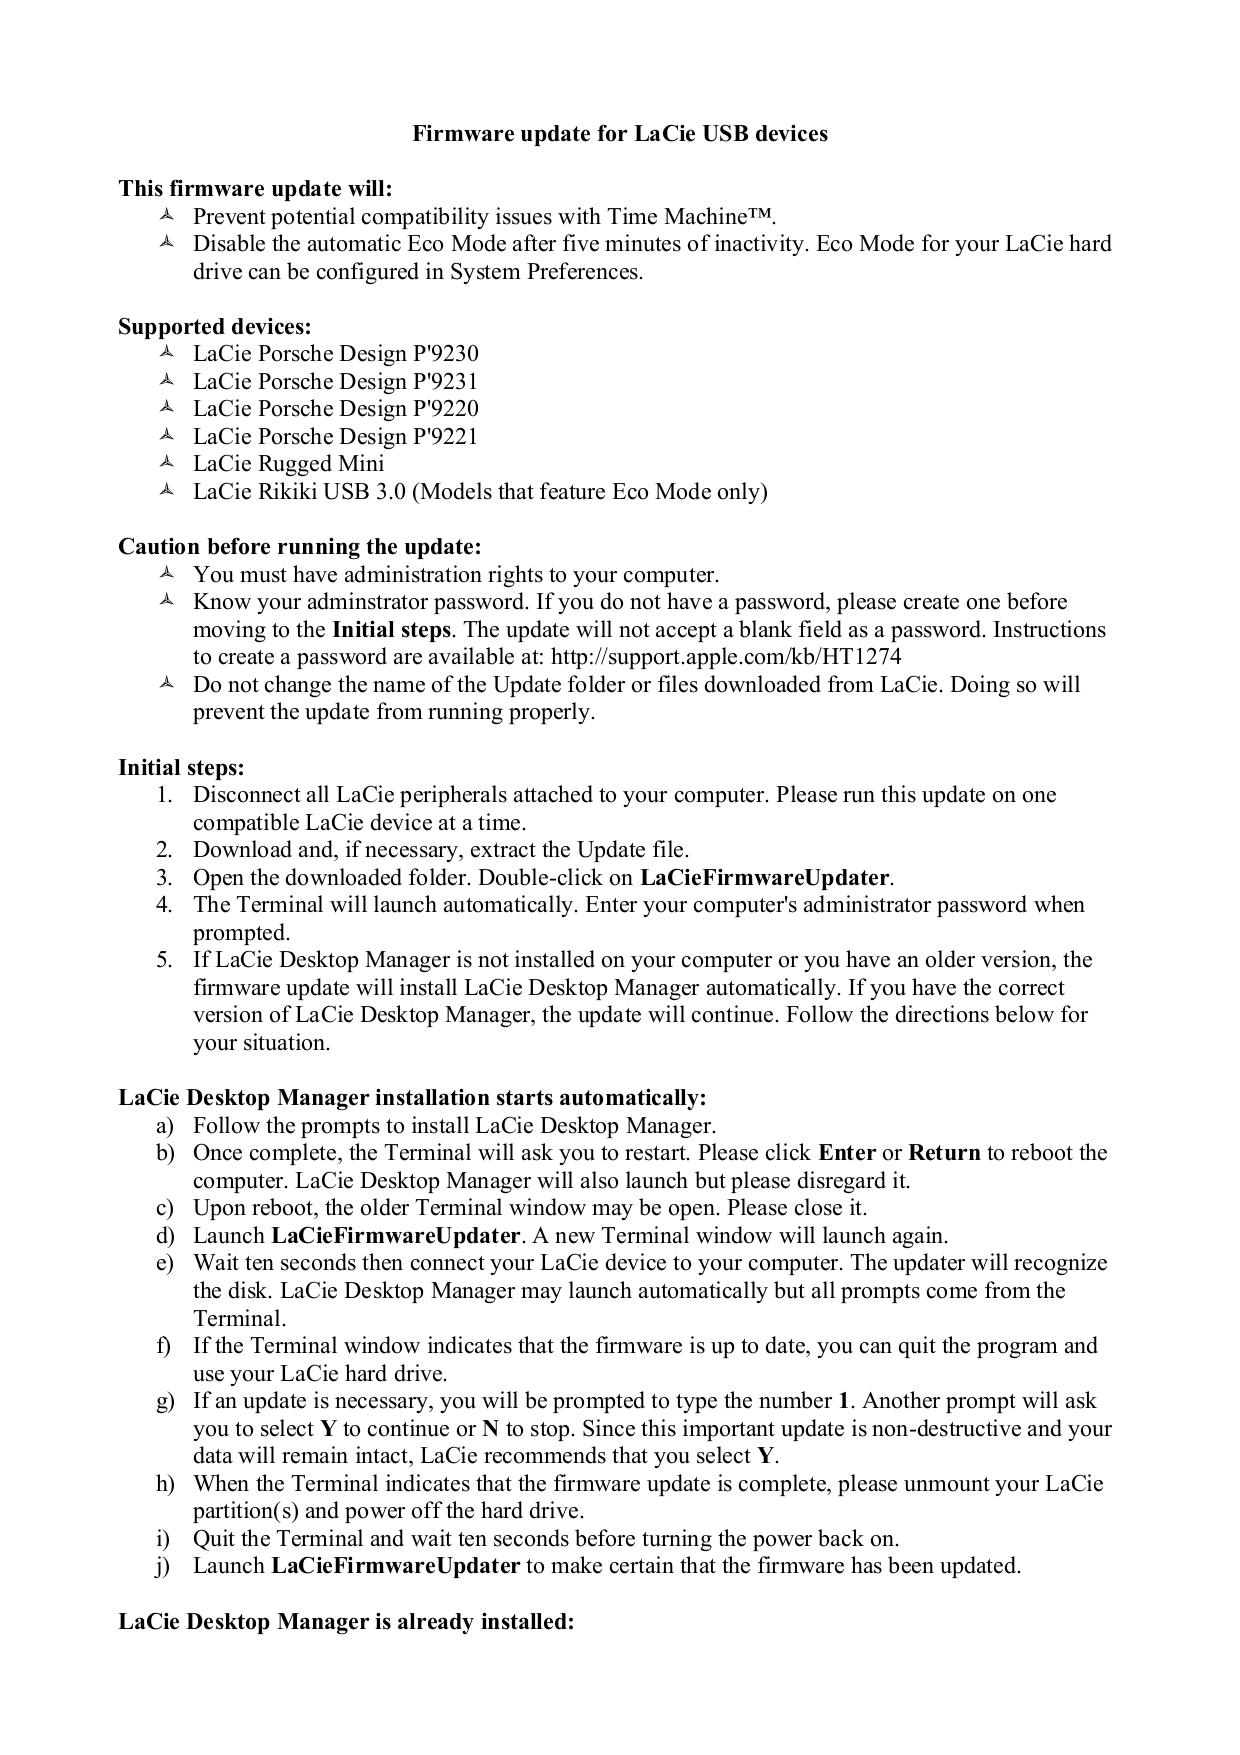 pdf for LaCie Storage 301304U manual